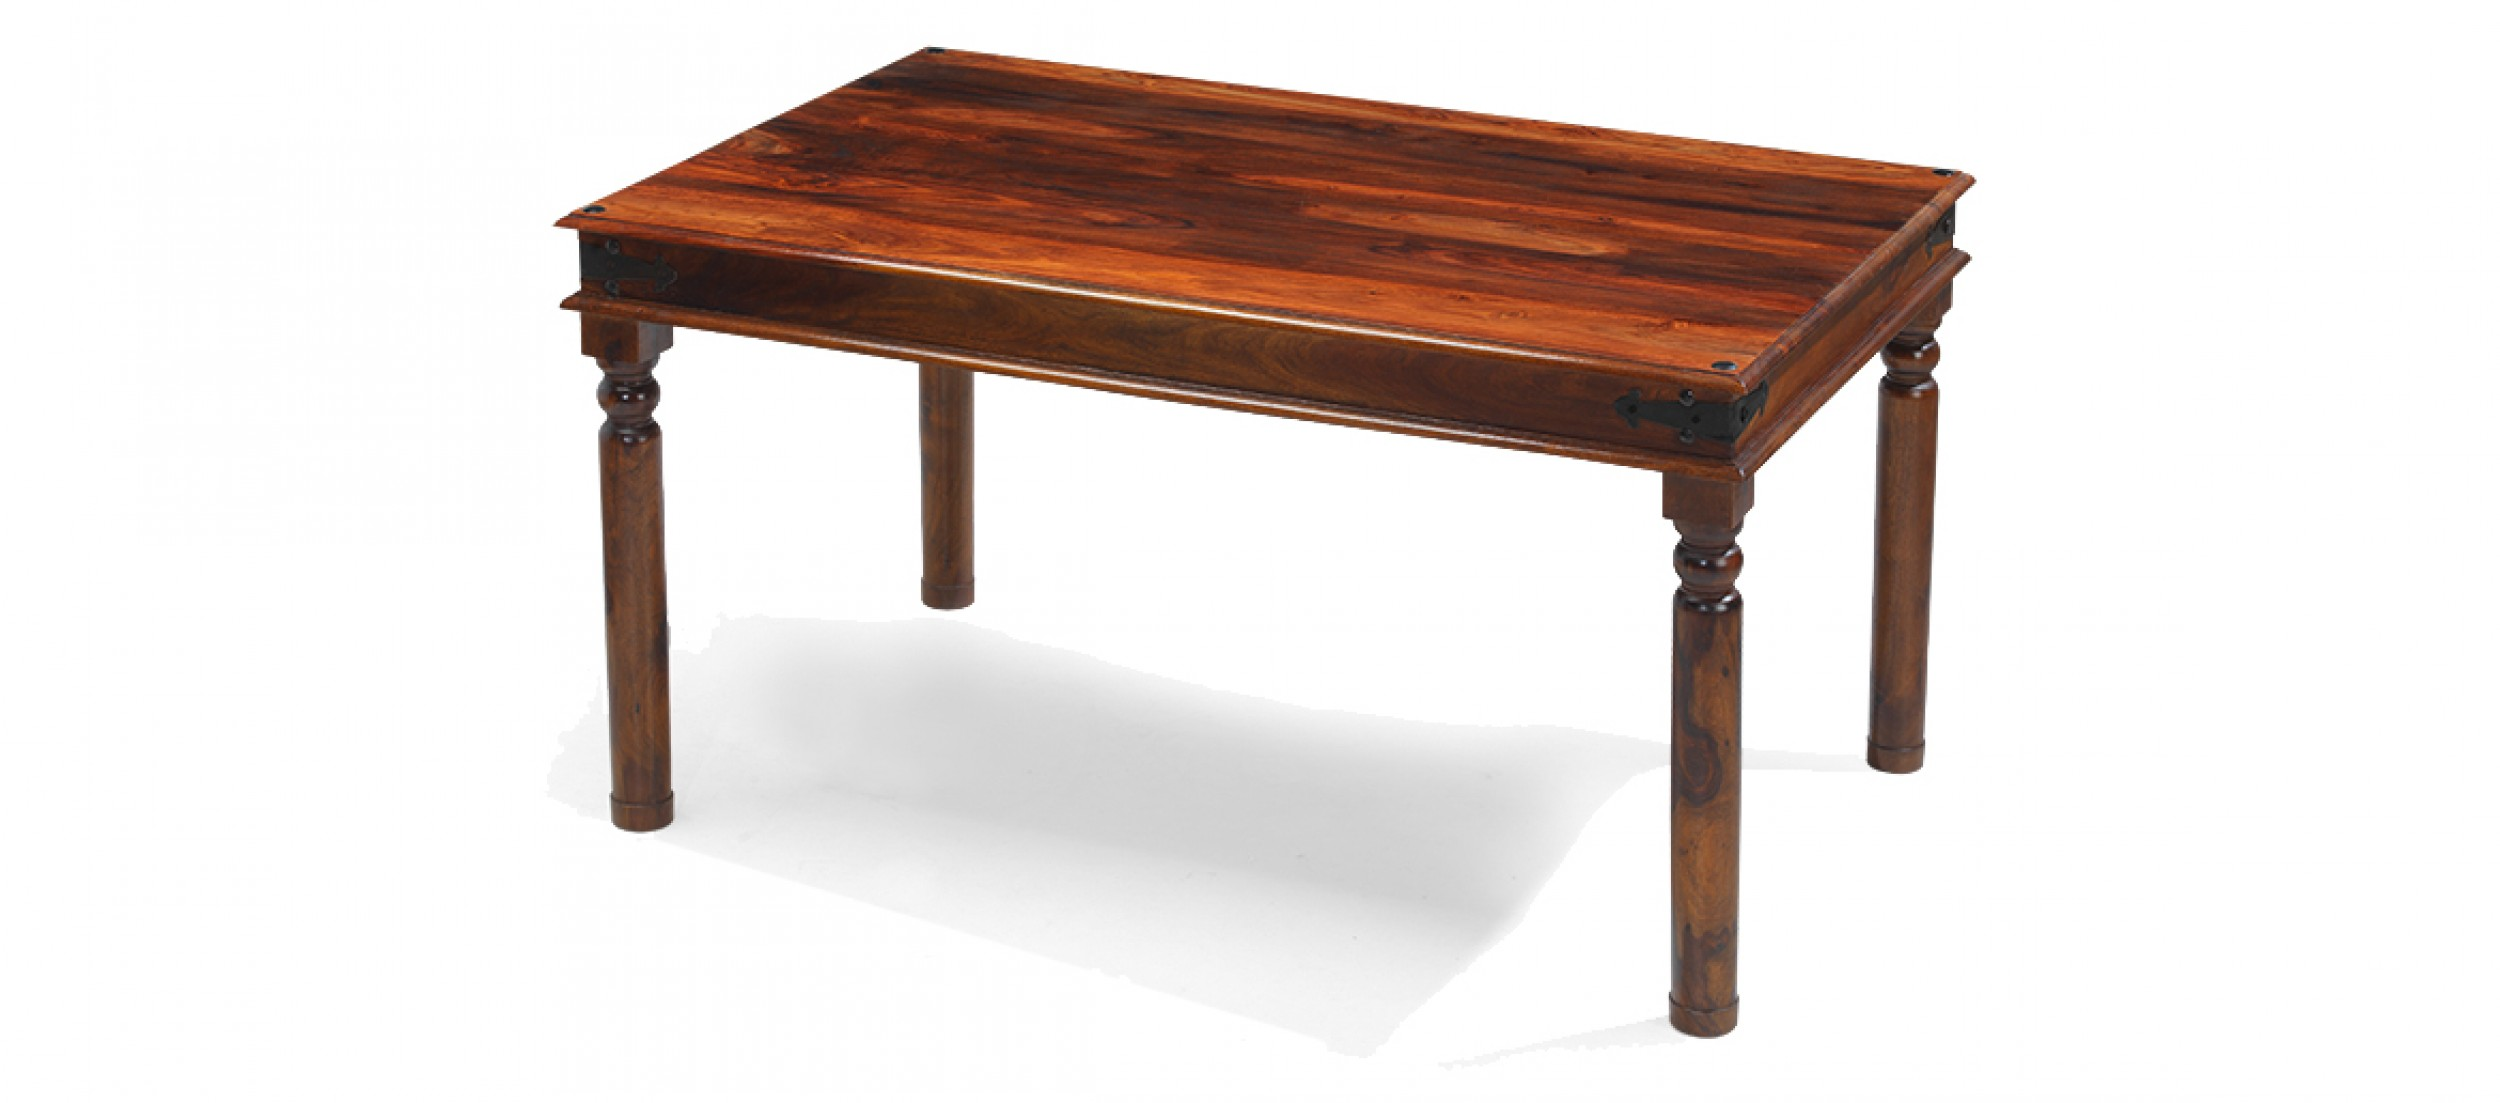 Jali sheesham 120 cm thakat dining table quercus living for Sheesham dining table